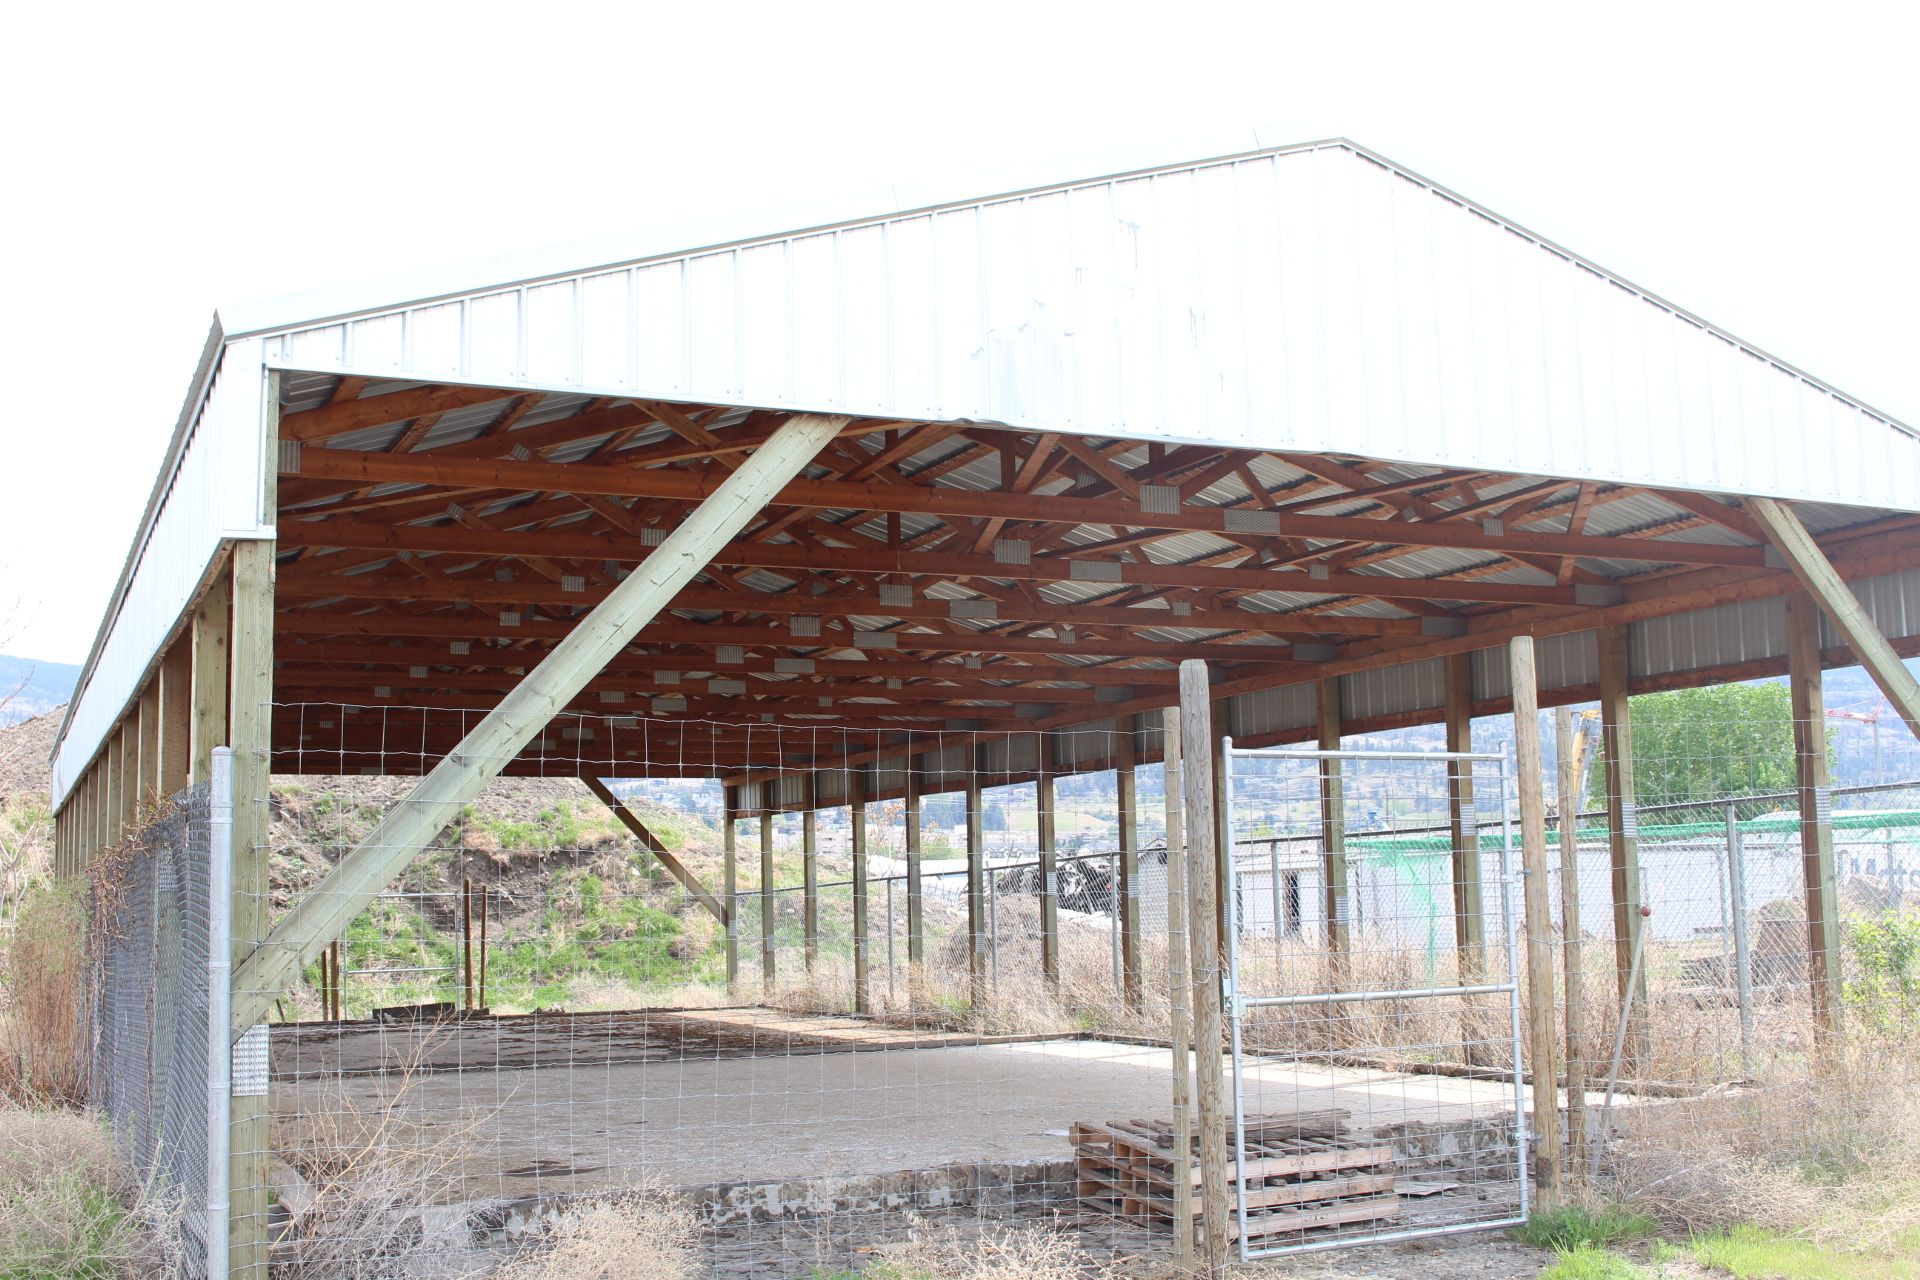 POLE BUILDING, 33' X 80' WOOD TRUSS, METAL CLAD ROOF